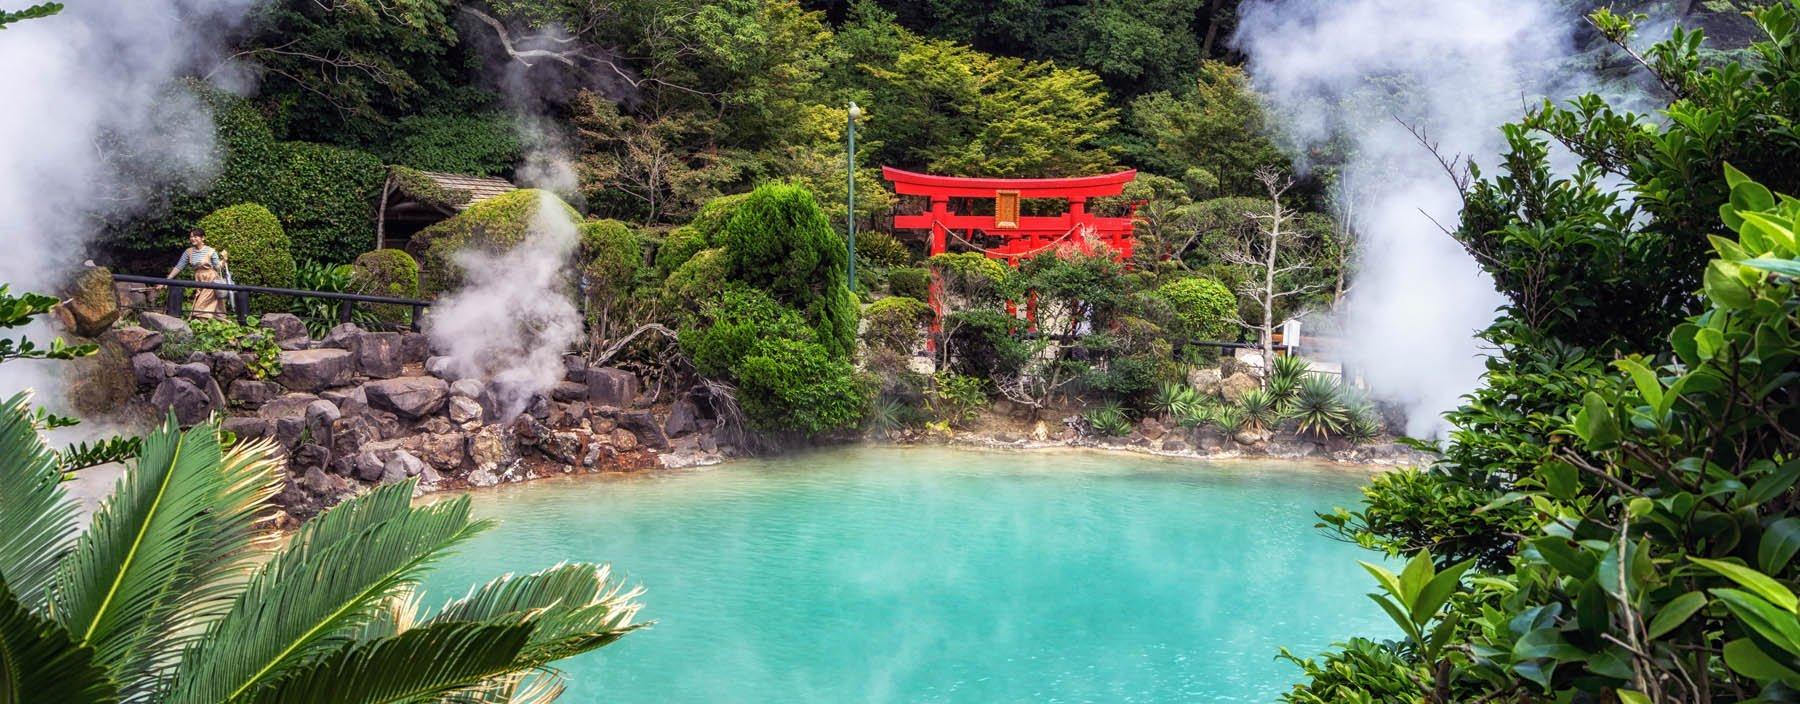 jp, beppu, hot spring.jpg